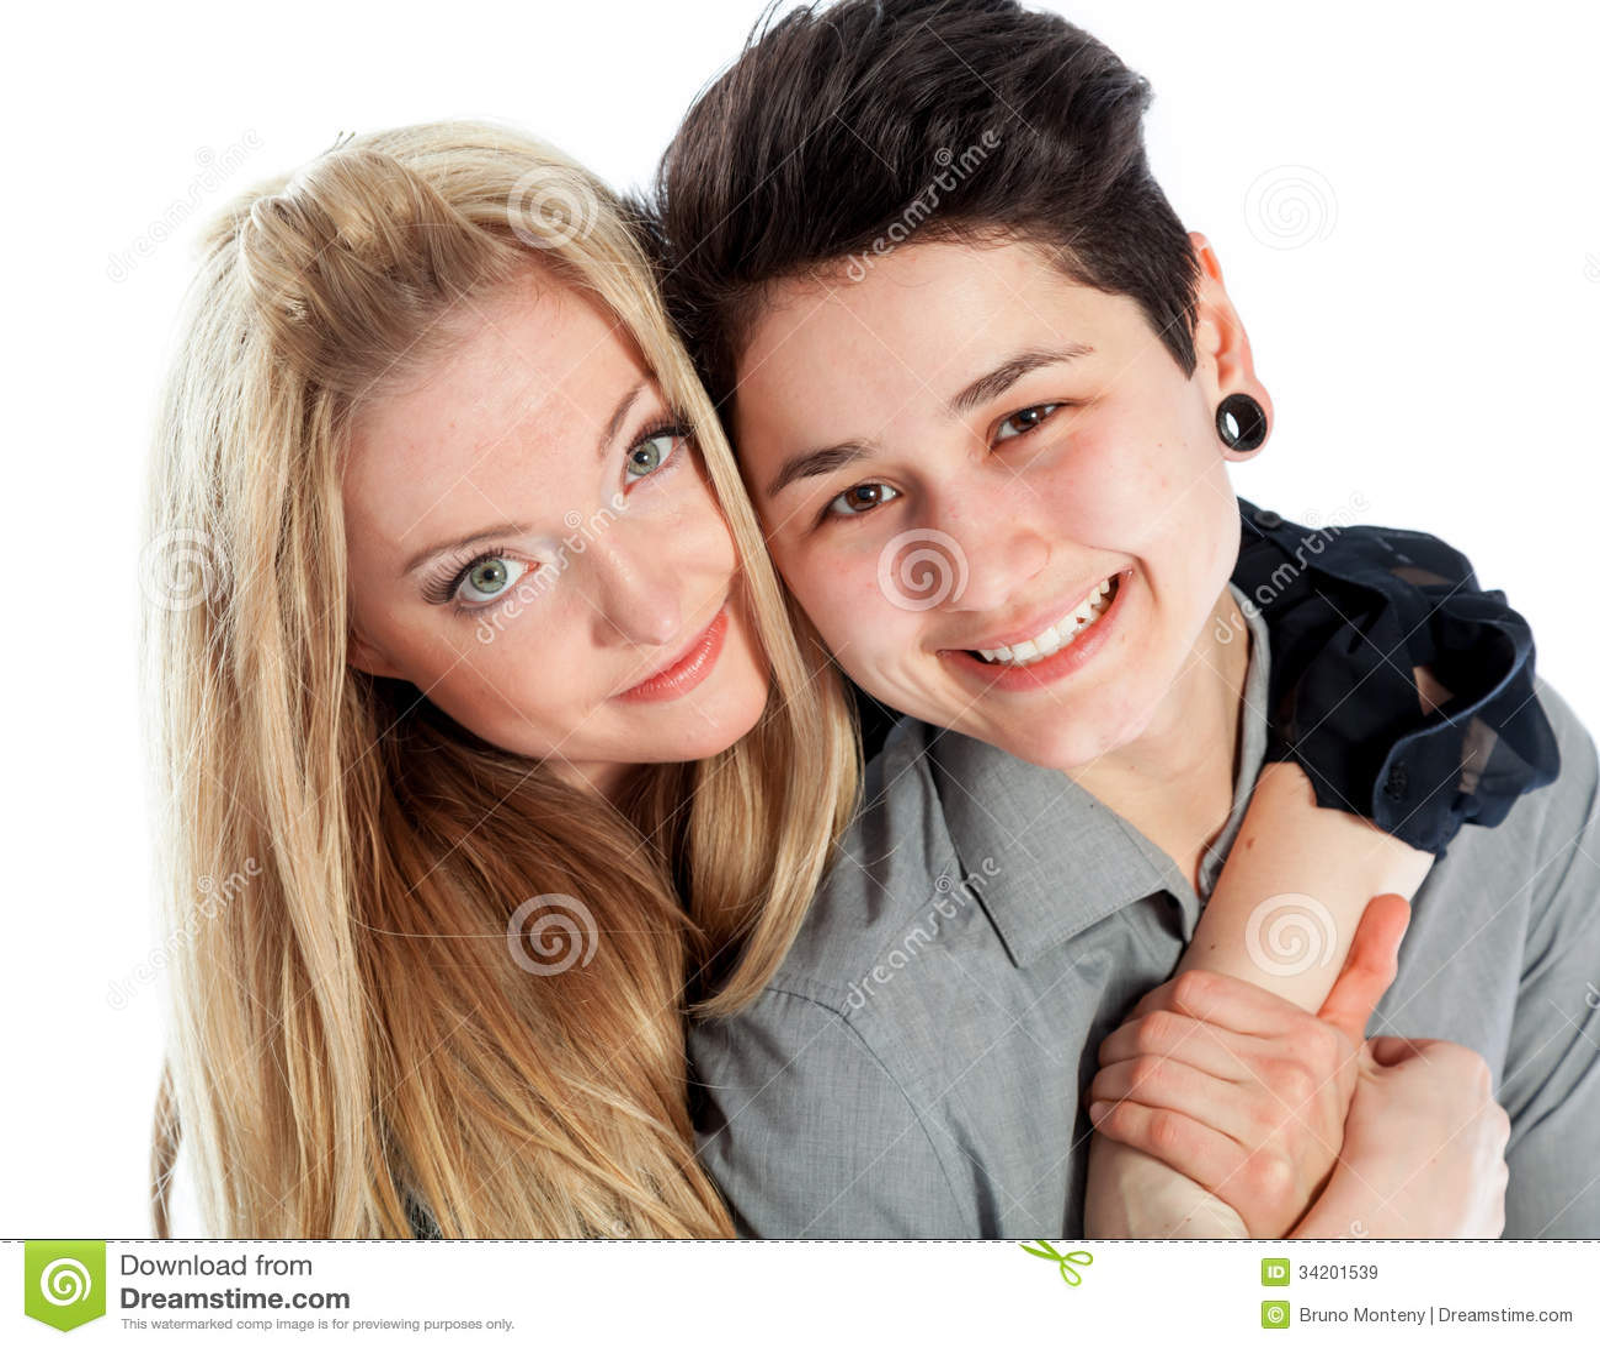 same sex couple isolated on white background stock image - image of